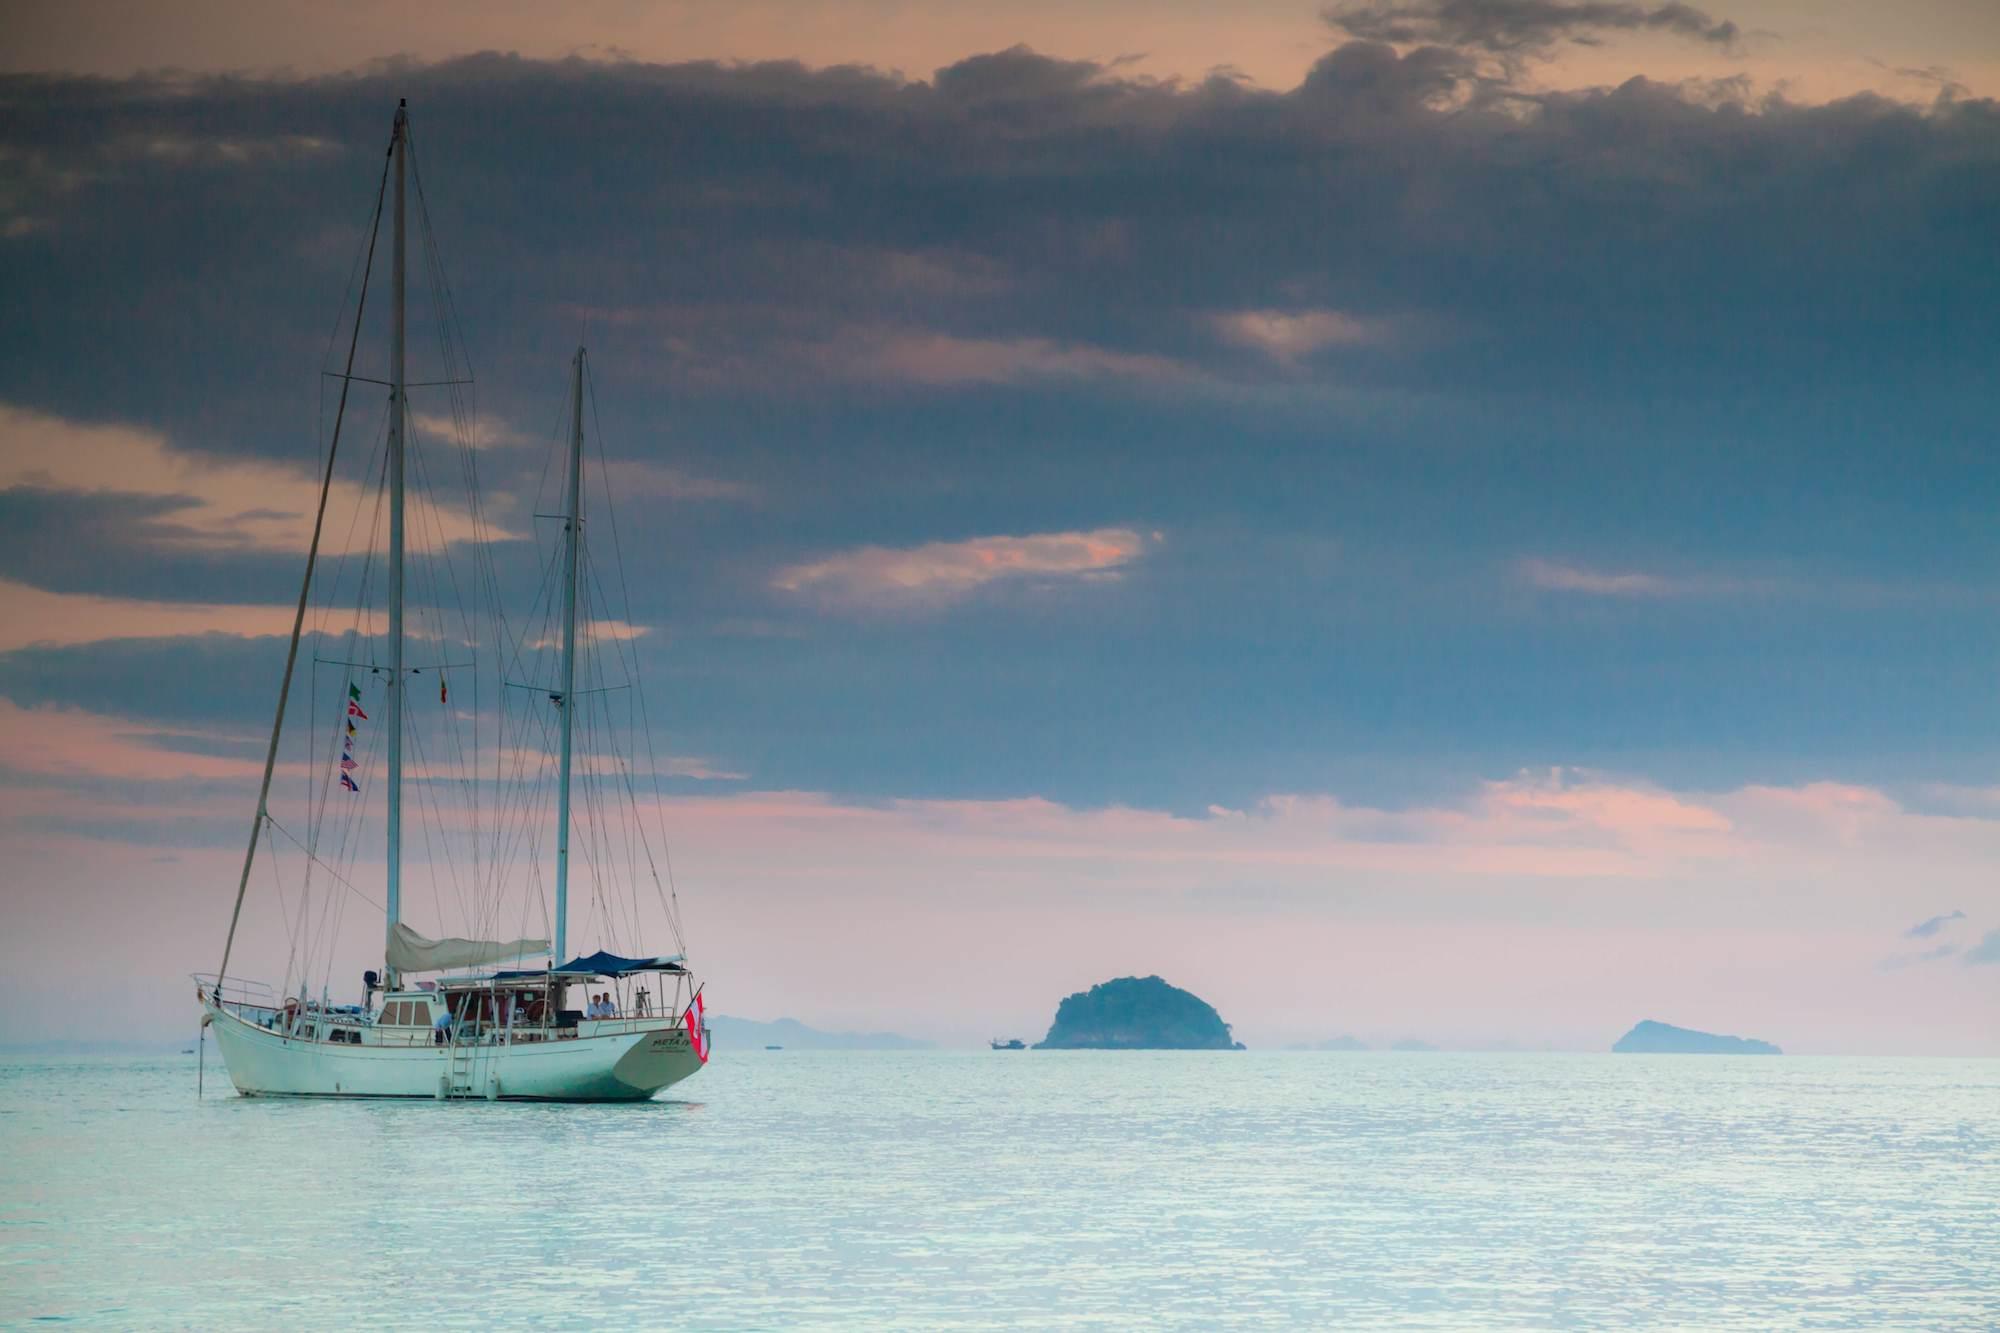 MetaIV_sailing_yacht_Myanmar_islands.jpg